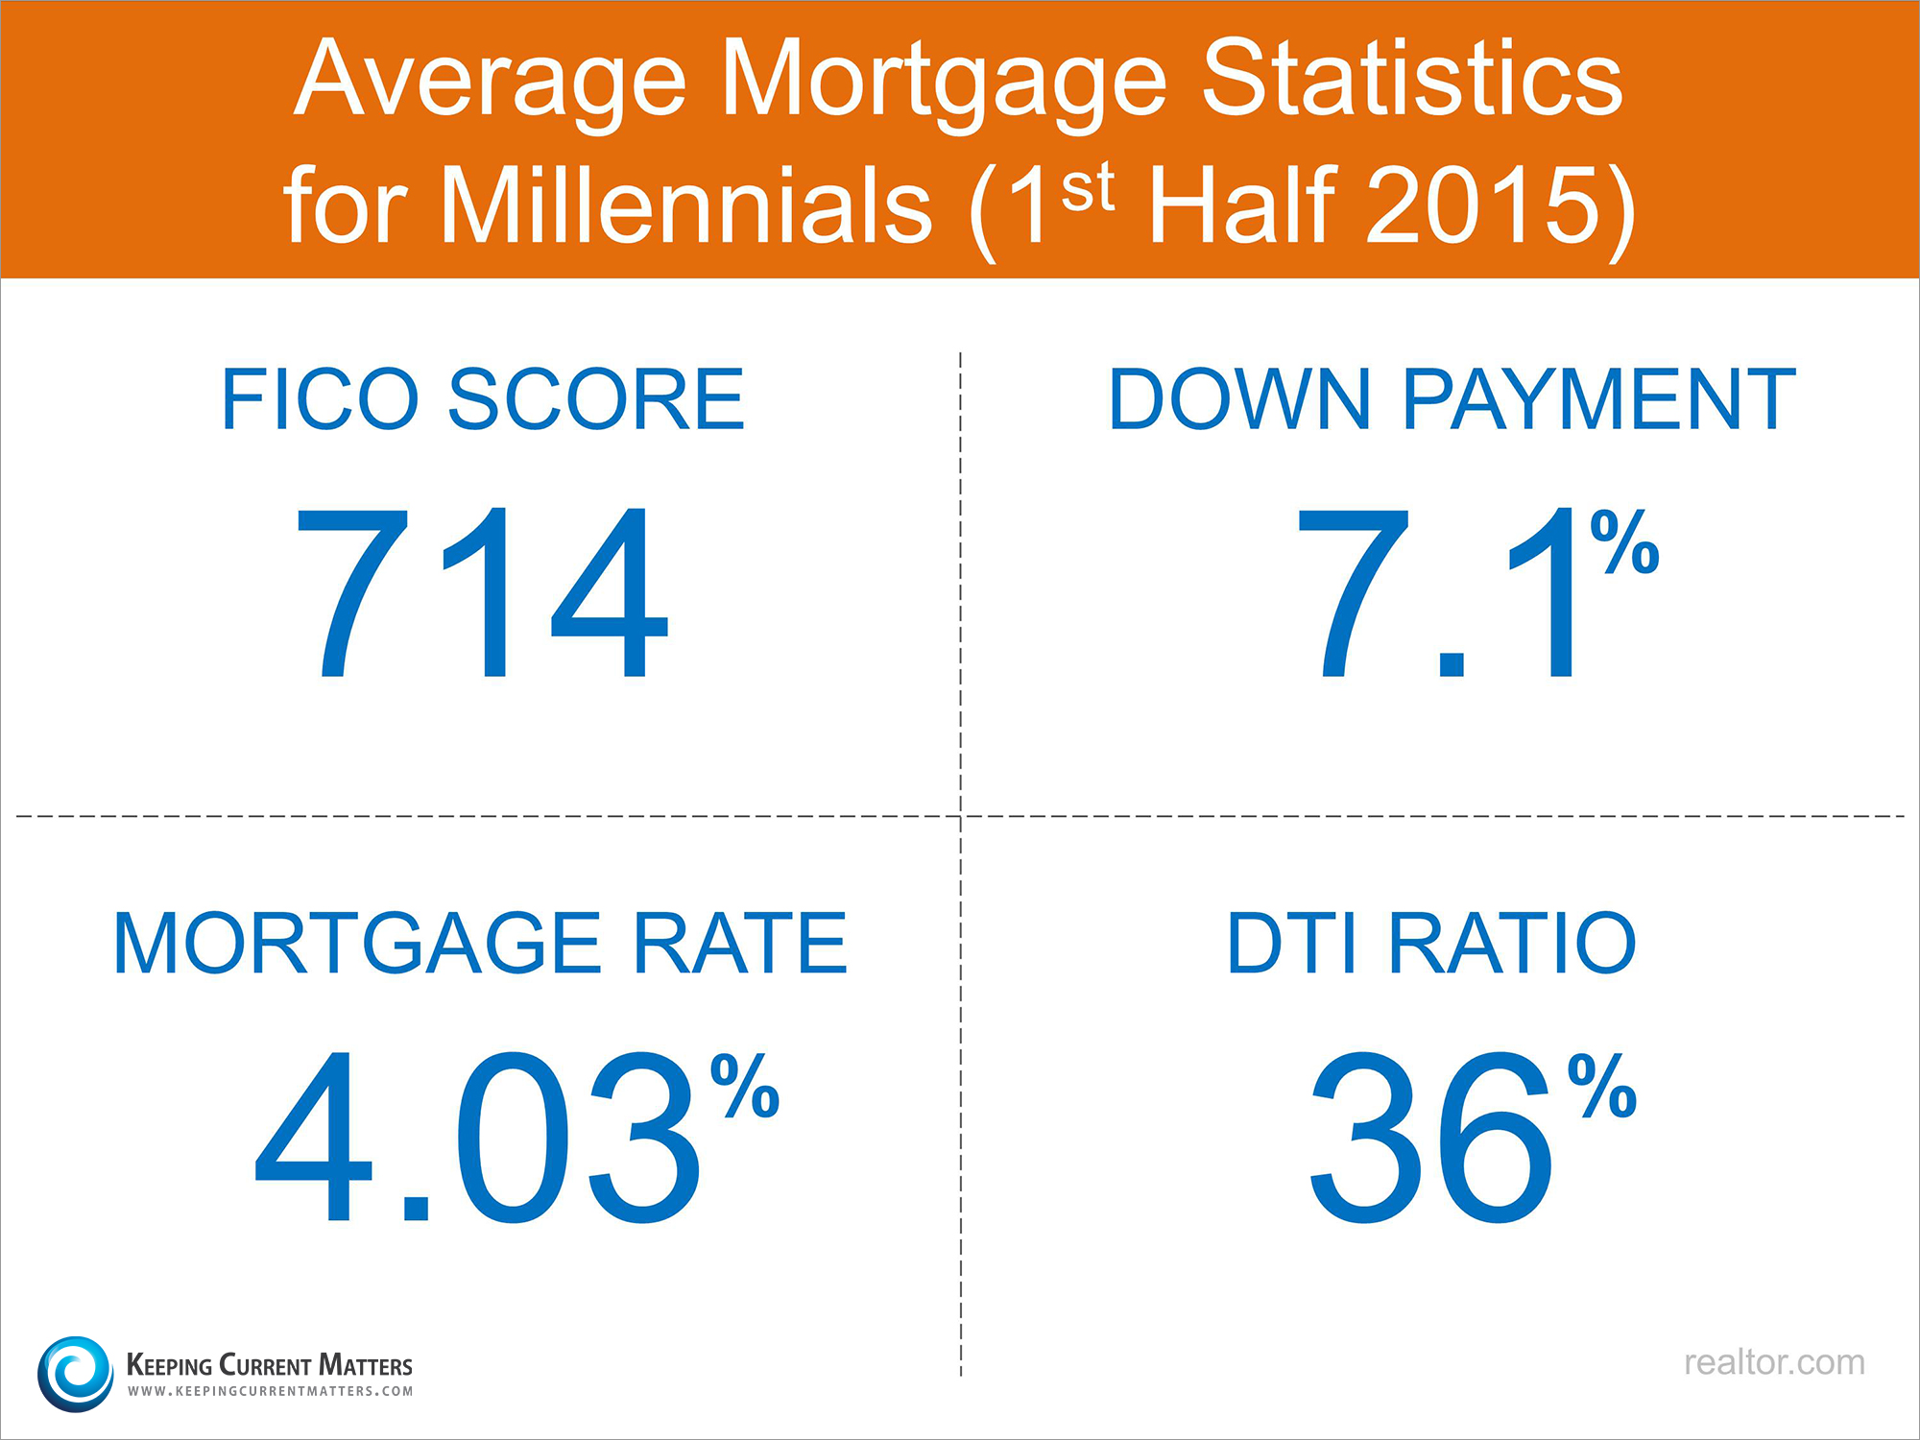 Millennial Mortgage Statistics | Keeping Current Matters